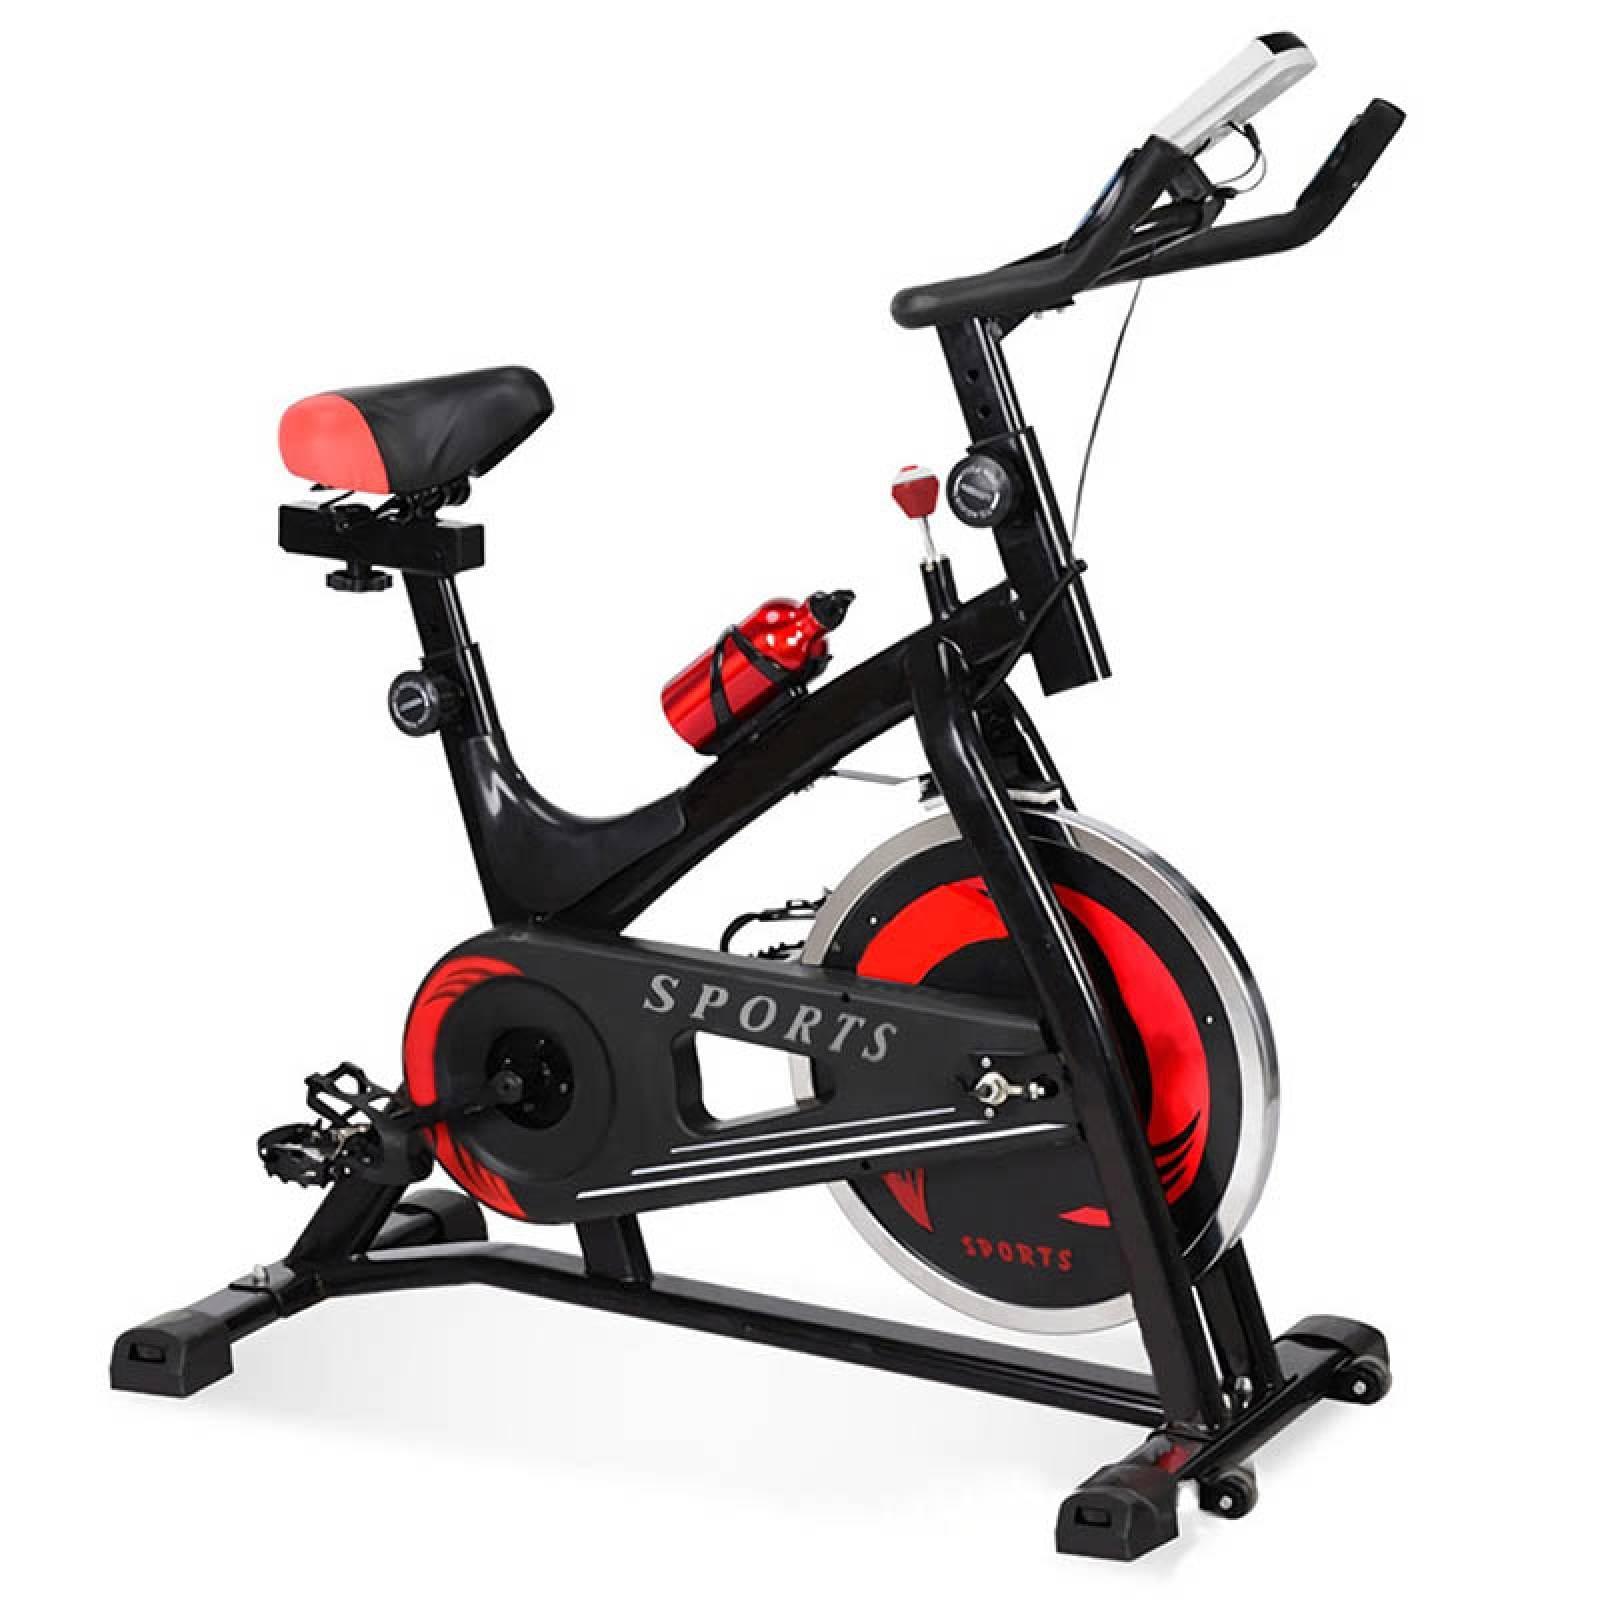 Bicicleta Spinning Fija Centurfit 6kg Botella Ejercicio Gym